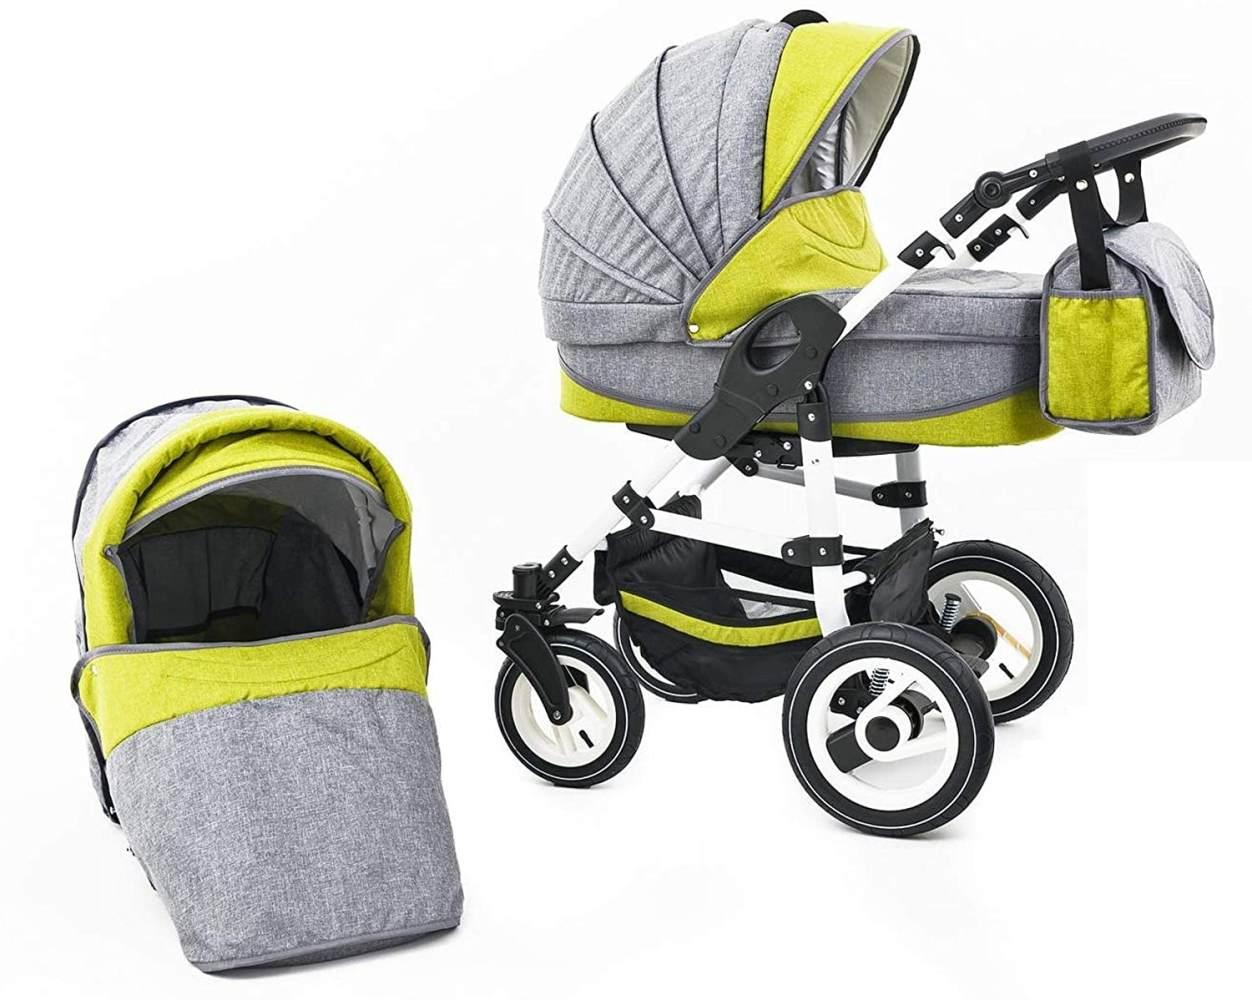 Tabbi ECO LN | 2 in 1 Kombi Kinderwagen | Luftreifen | Farbe: Green Bild 1